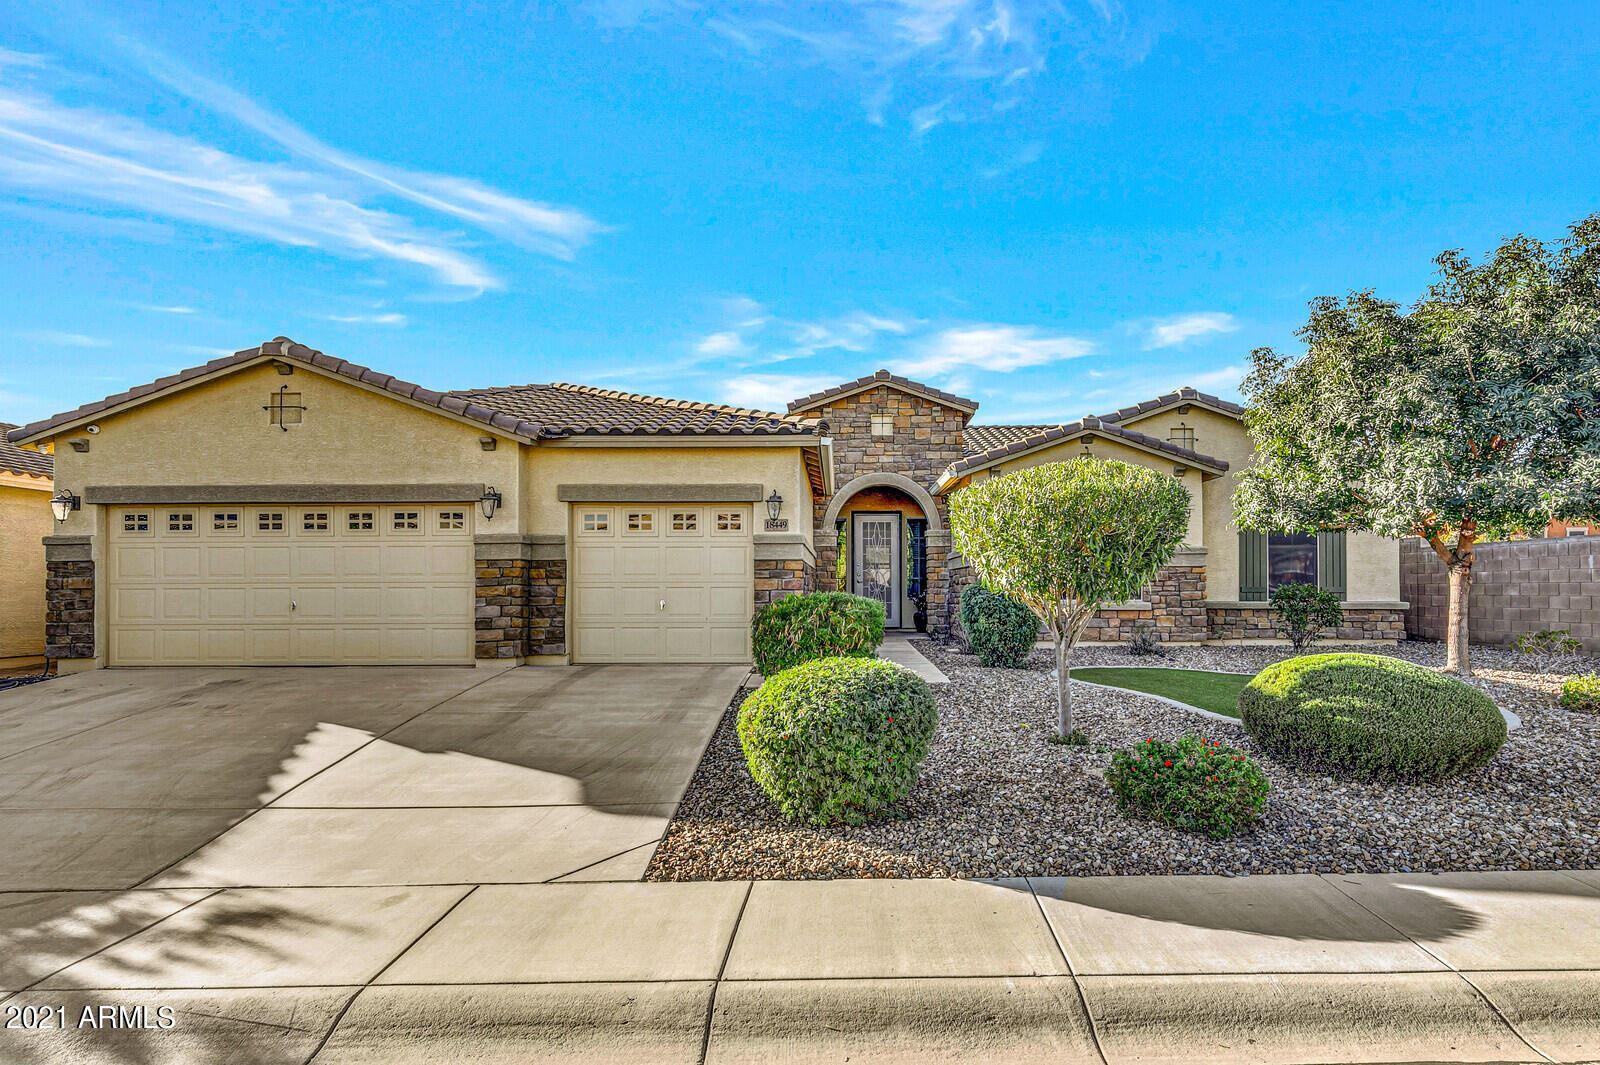 Photo of 18449 W DESERT Lane, Surprise, AZ 85388 (MLS # 6306287)